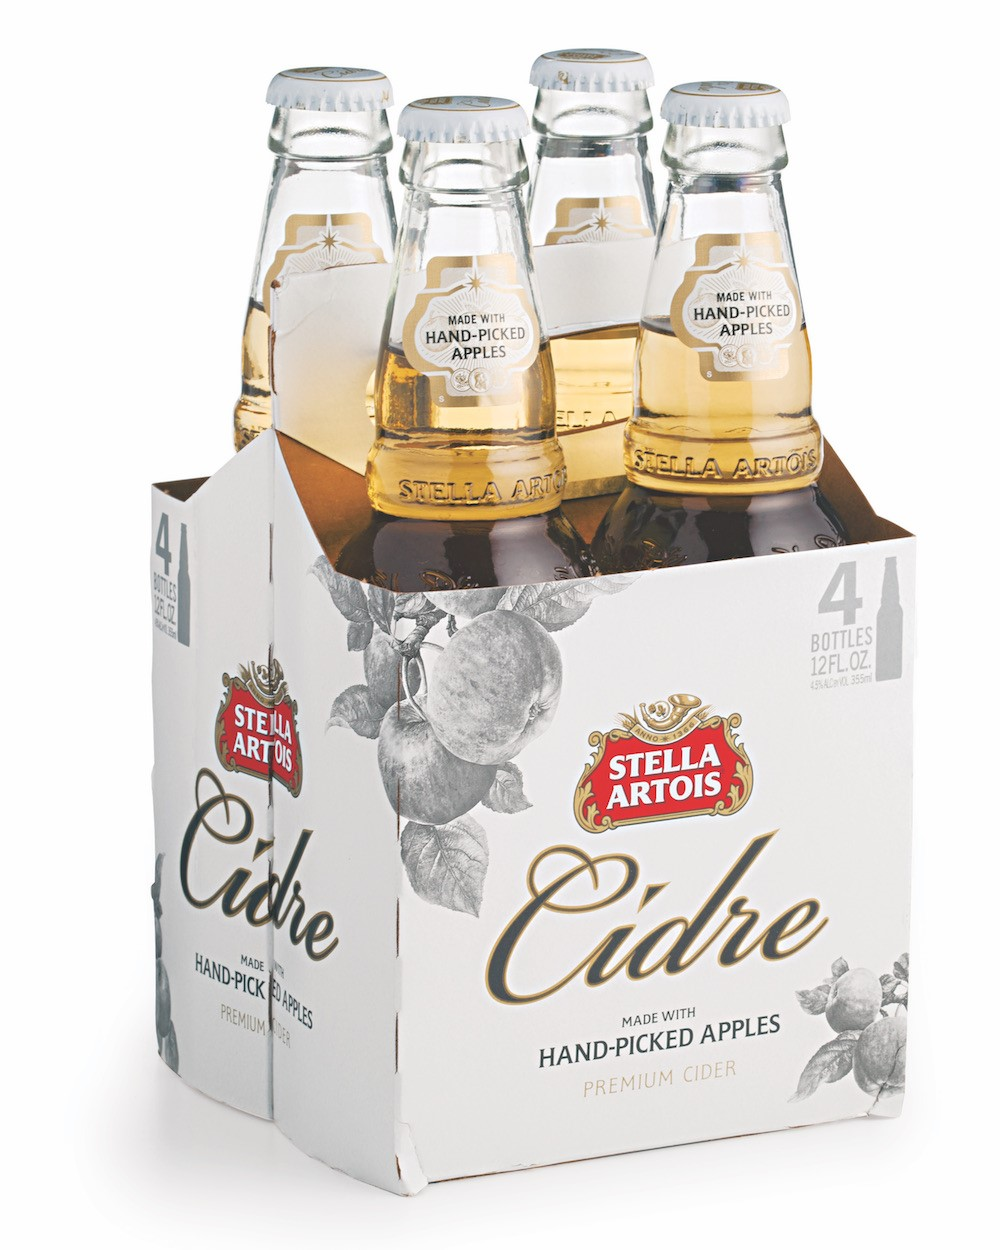 Stella Artois Cidre 4-Pack